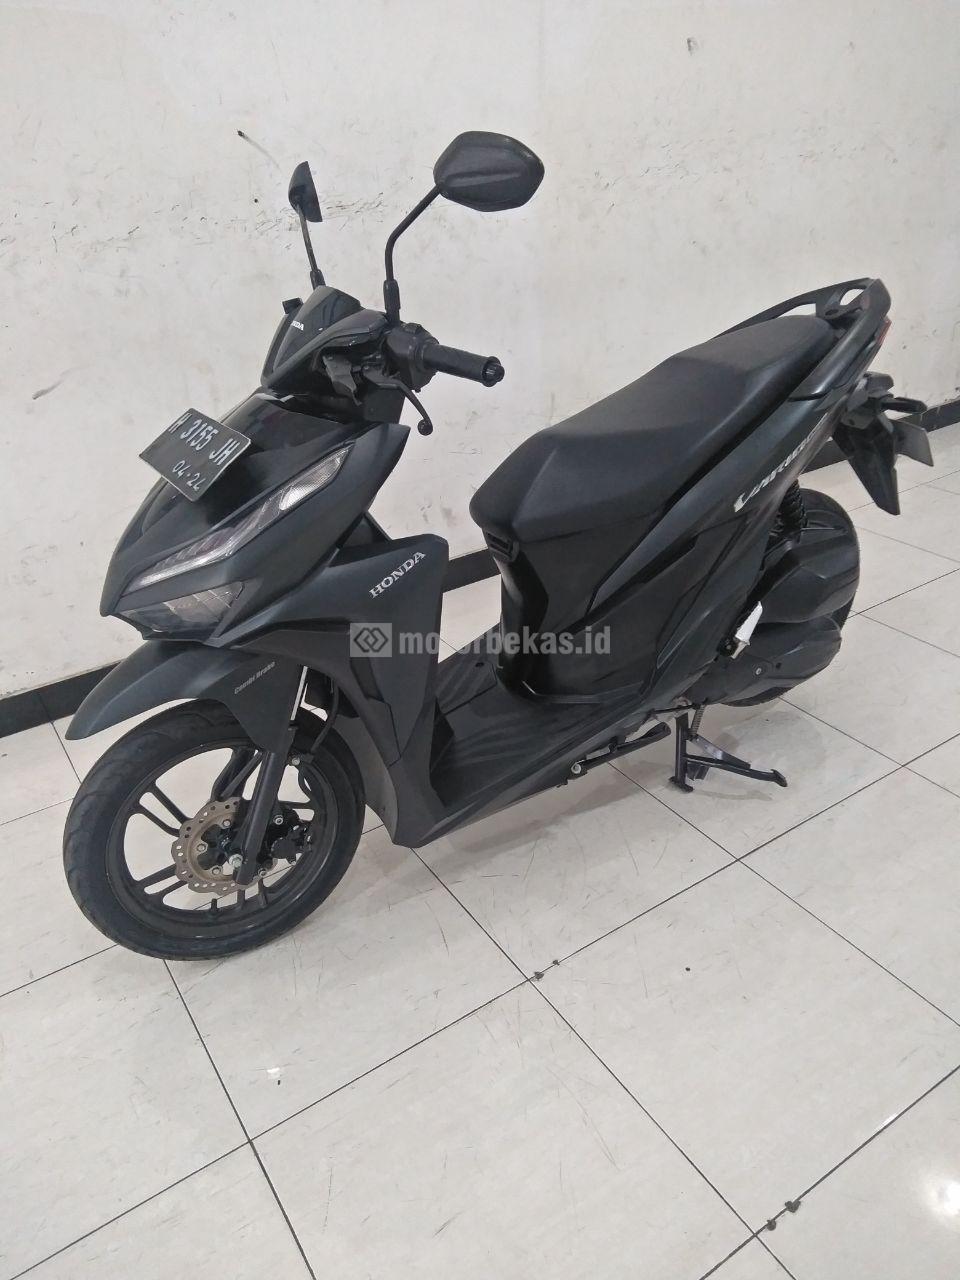 HONDA VARIO 150 SPORTY  3455 motorbekas.id